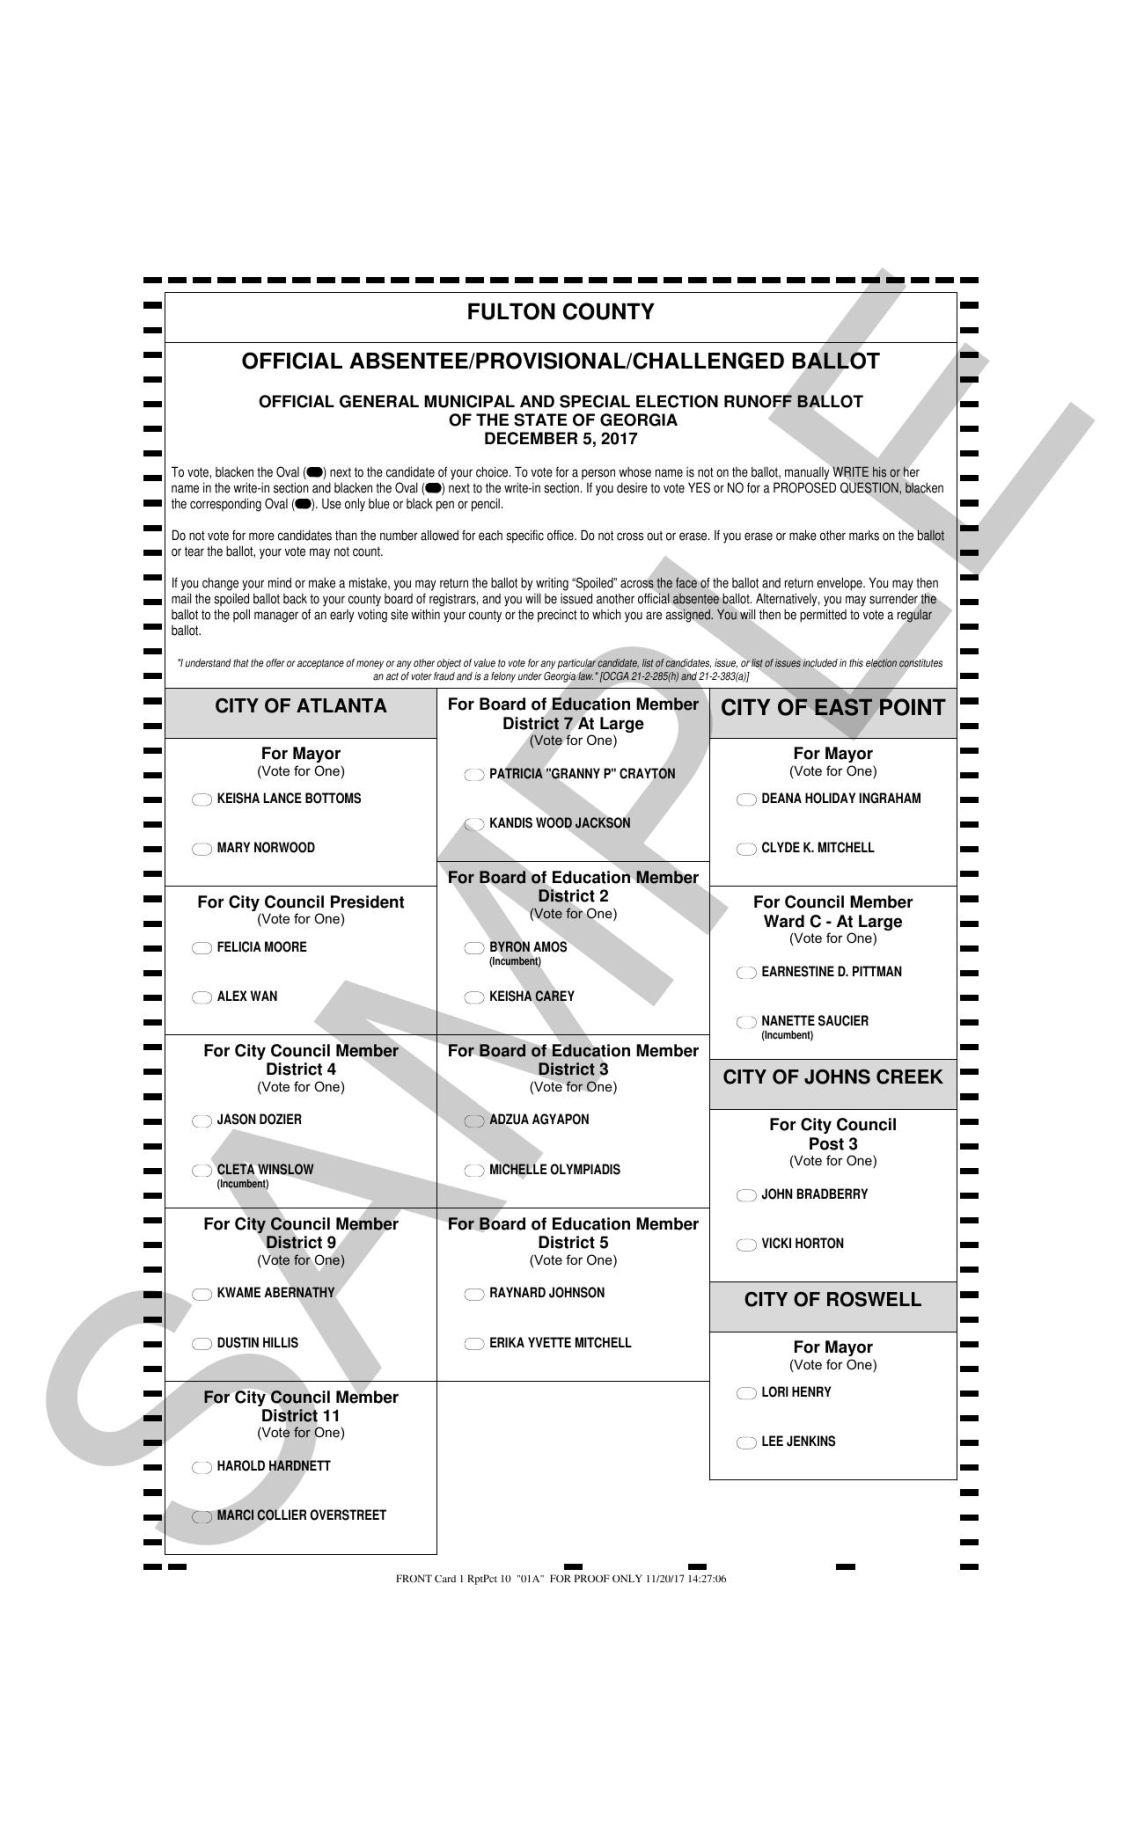 Fulton County runoff sample ballot | NeighborNewsOnline ...